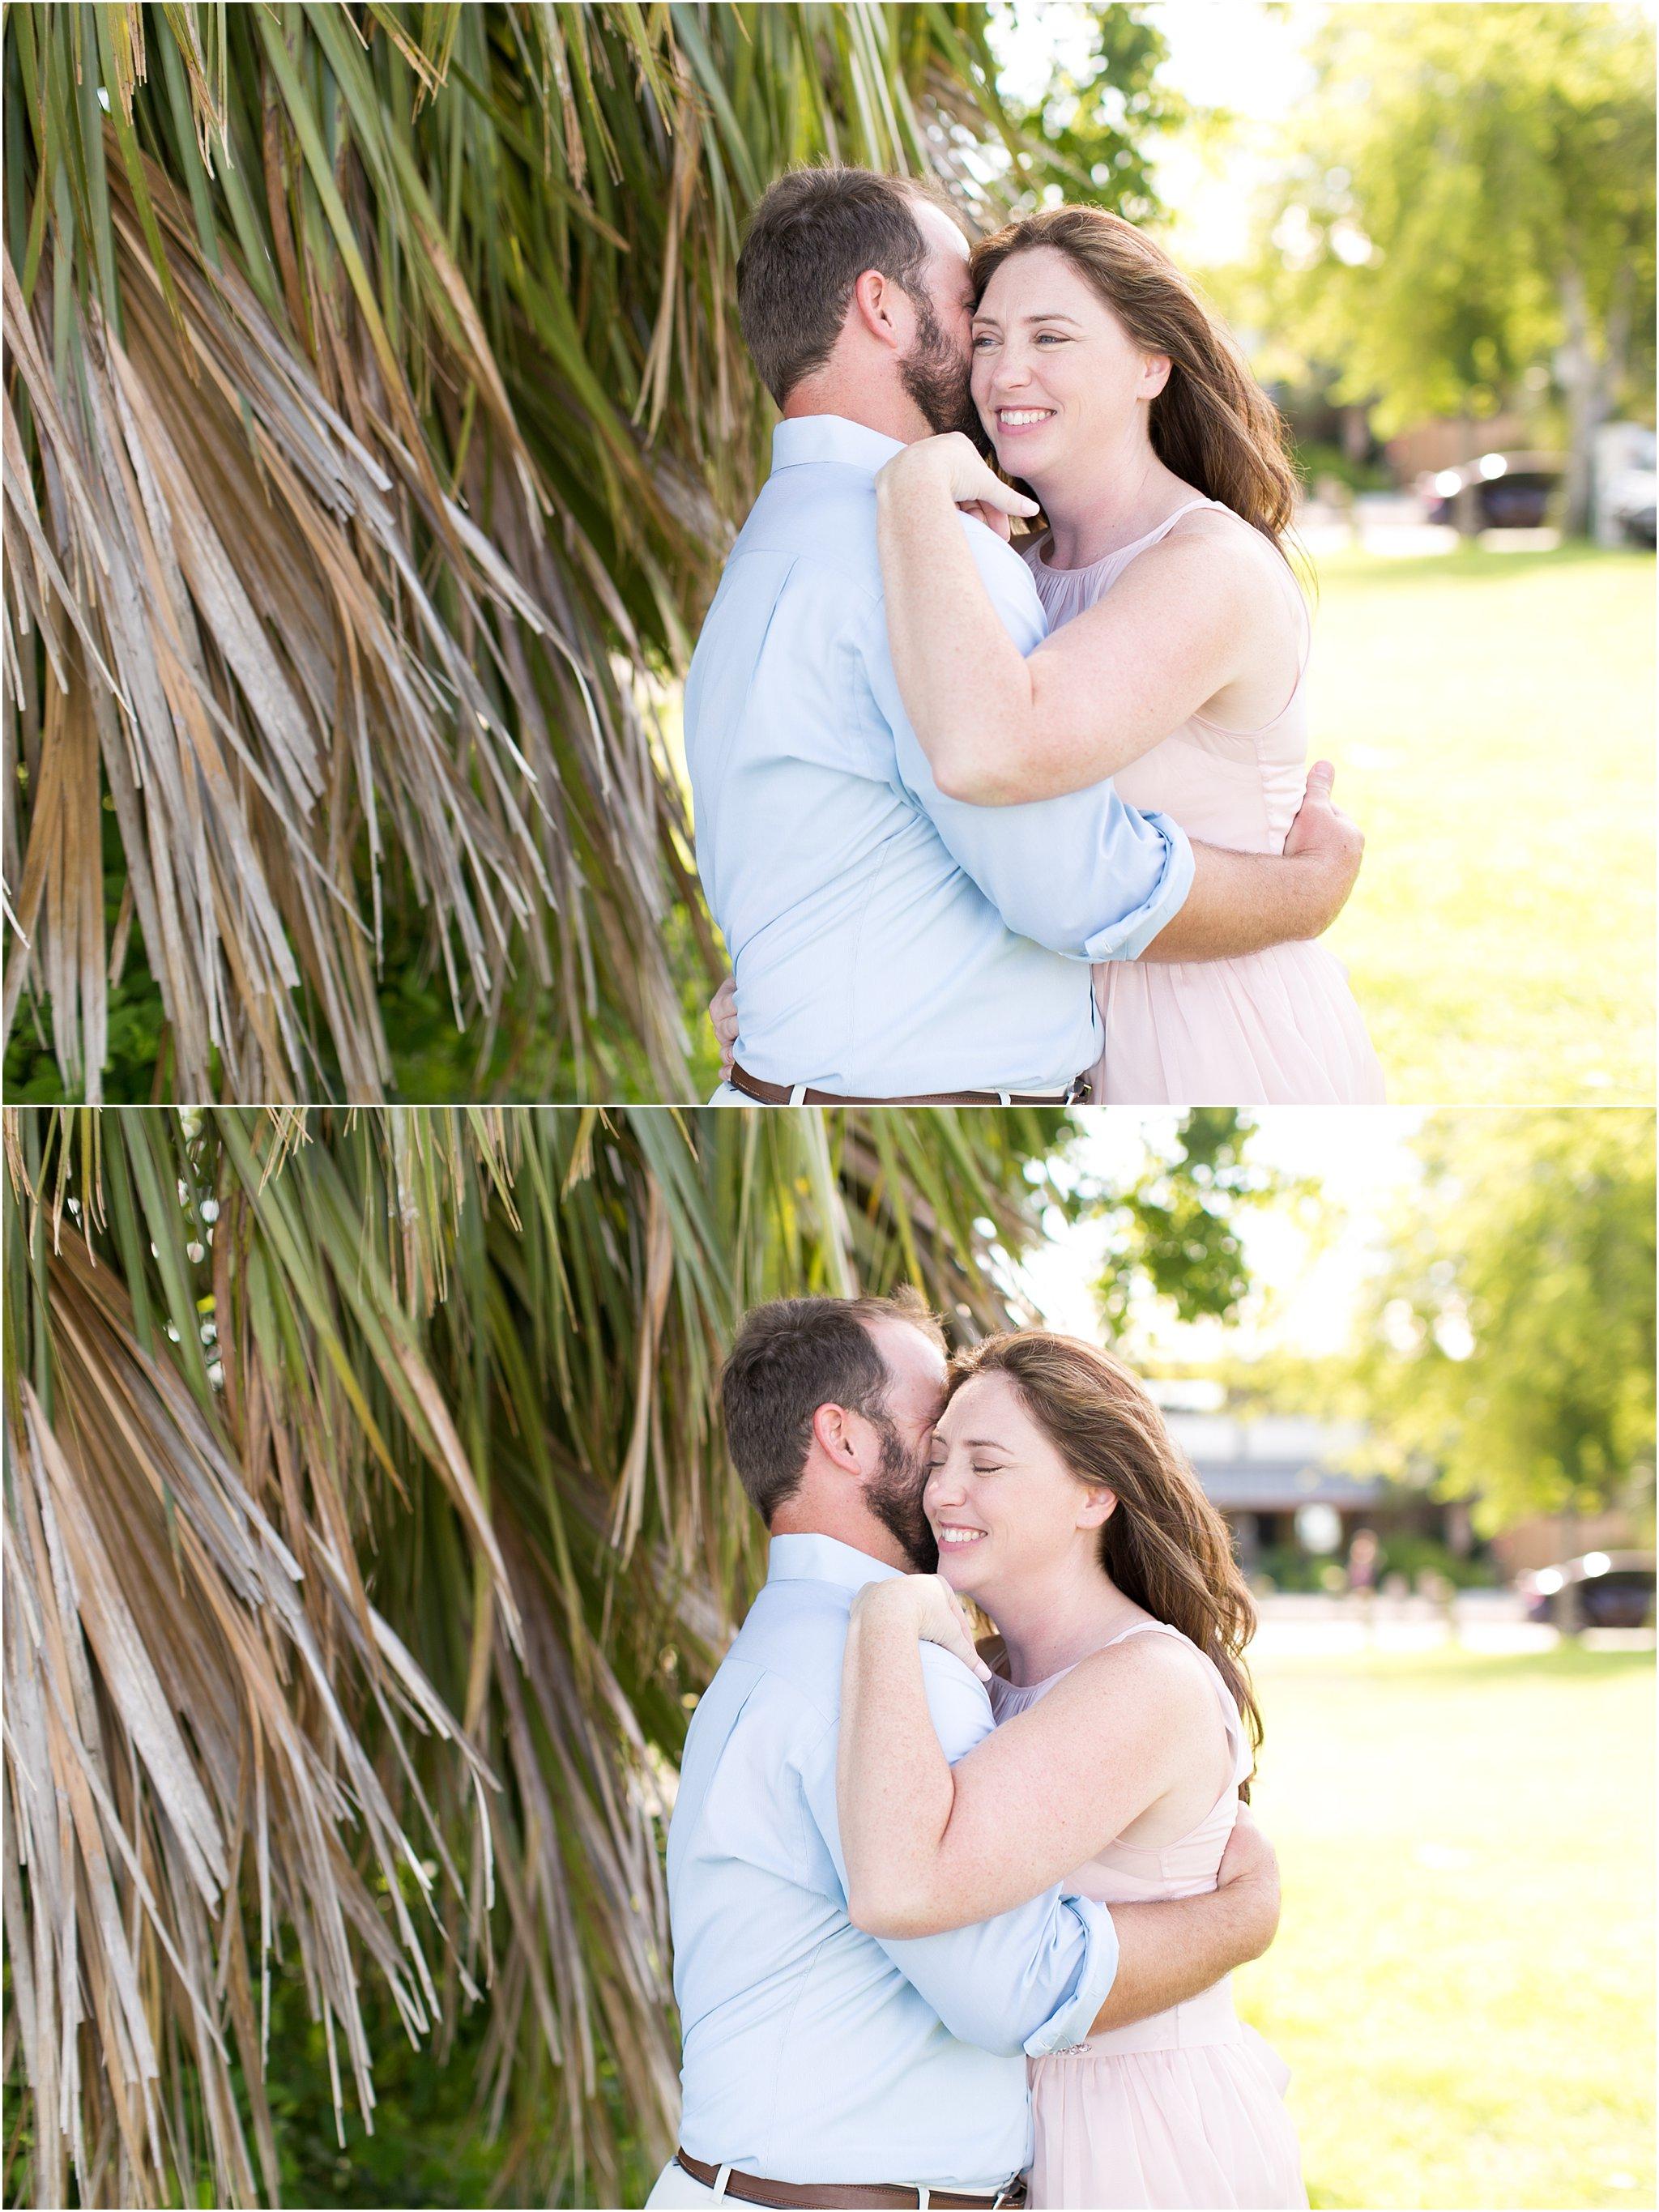 jessica_ryan_photography_wedding_photographs_virginia_fernandina_beach_florida_wedding_2121